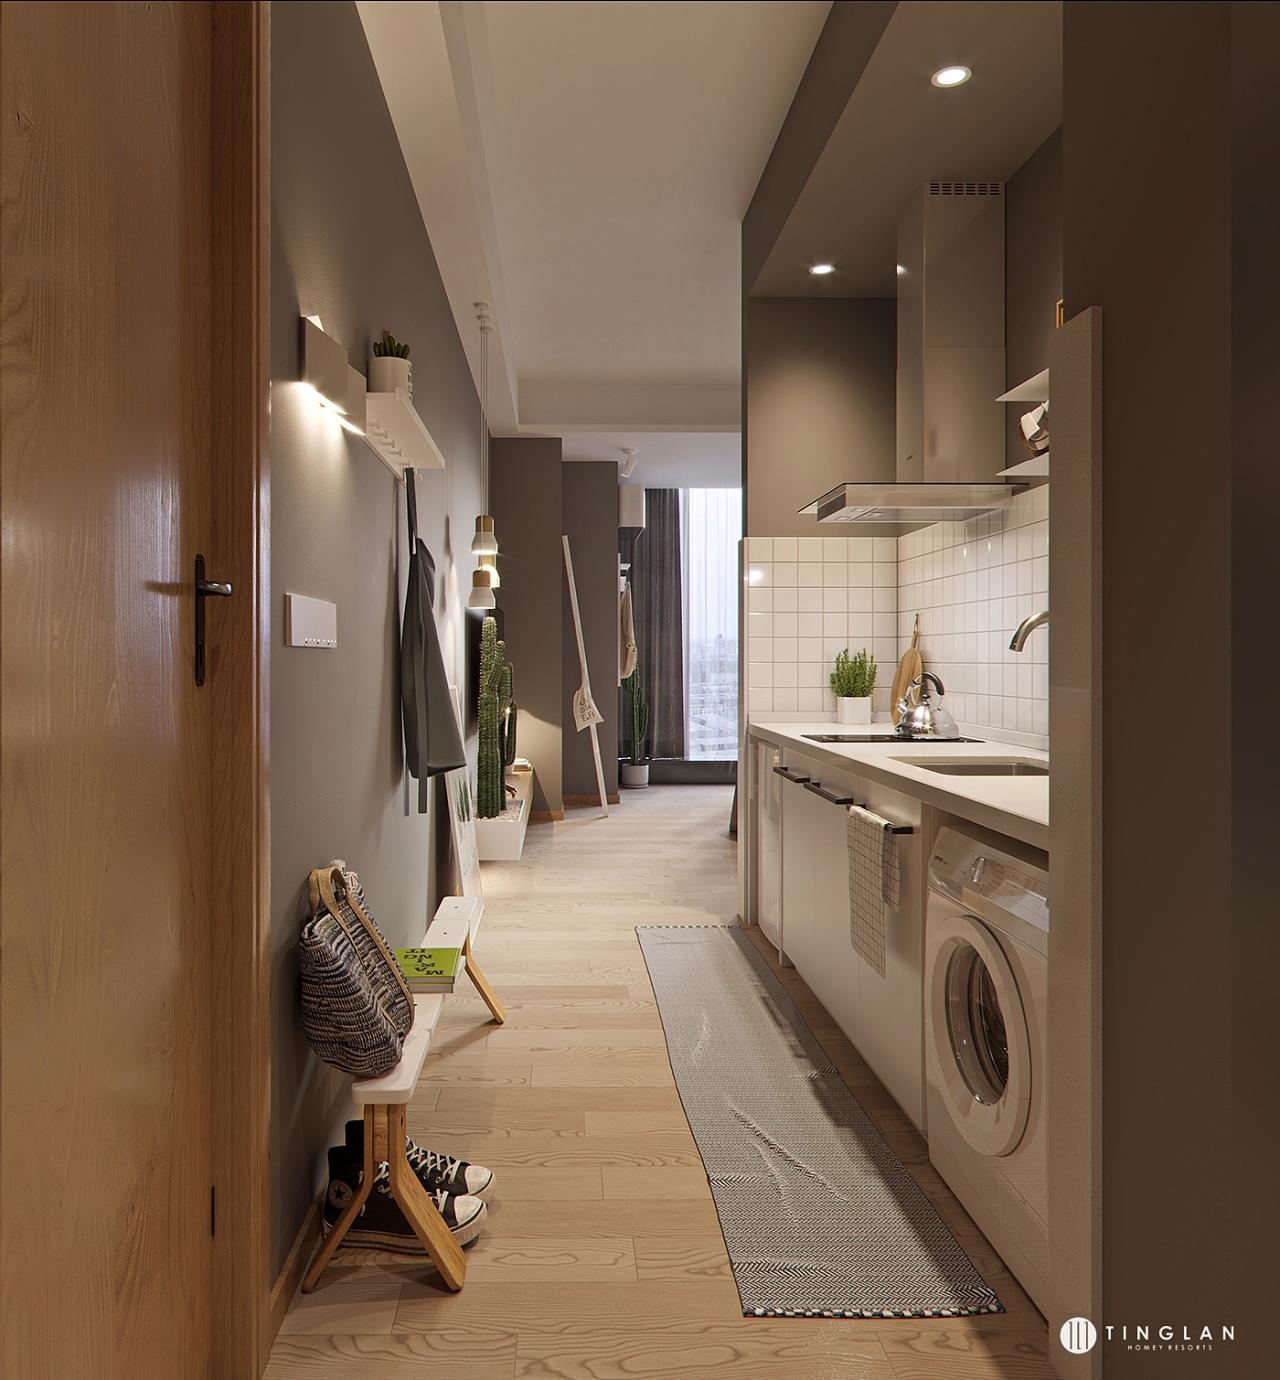 Проект квартиры-студии, метраж не указан.